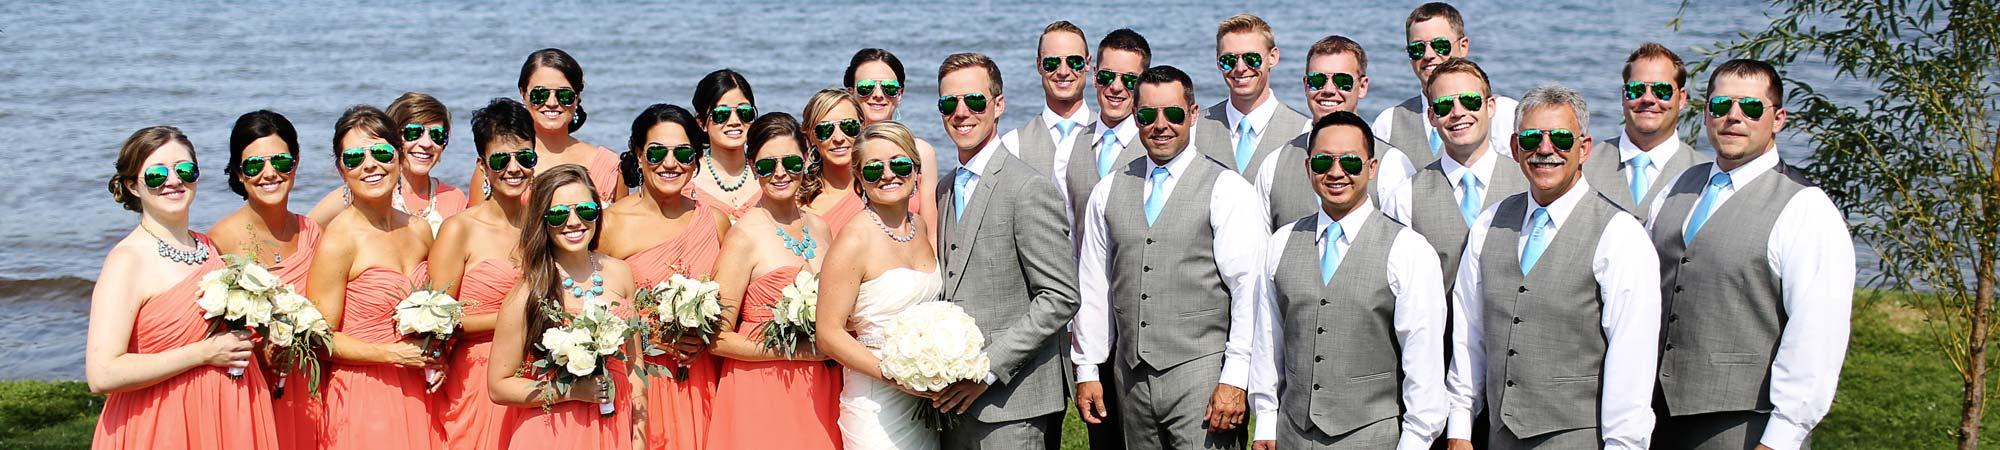 68-2817_Wedding_2000x450_Sliders_C2